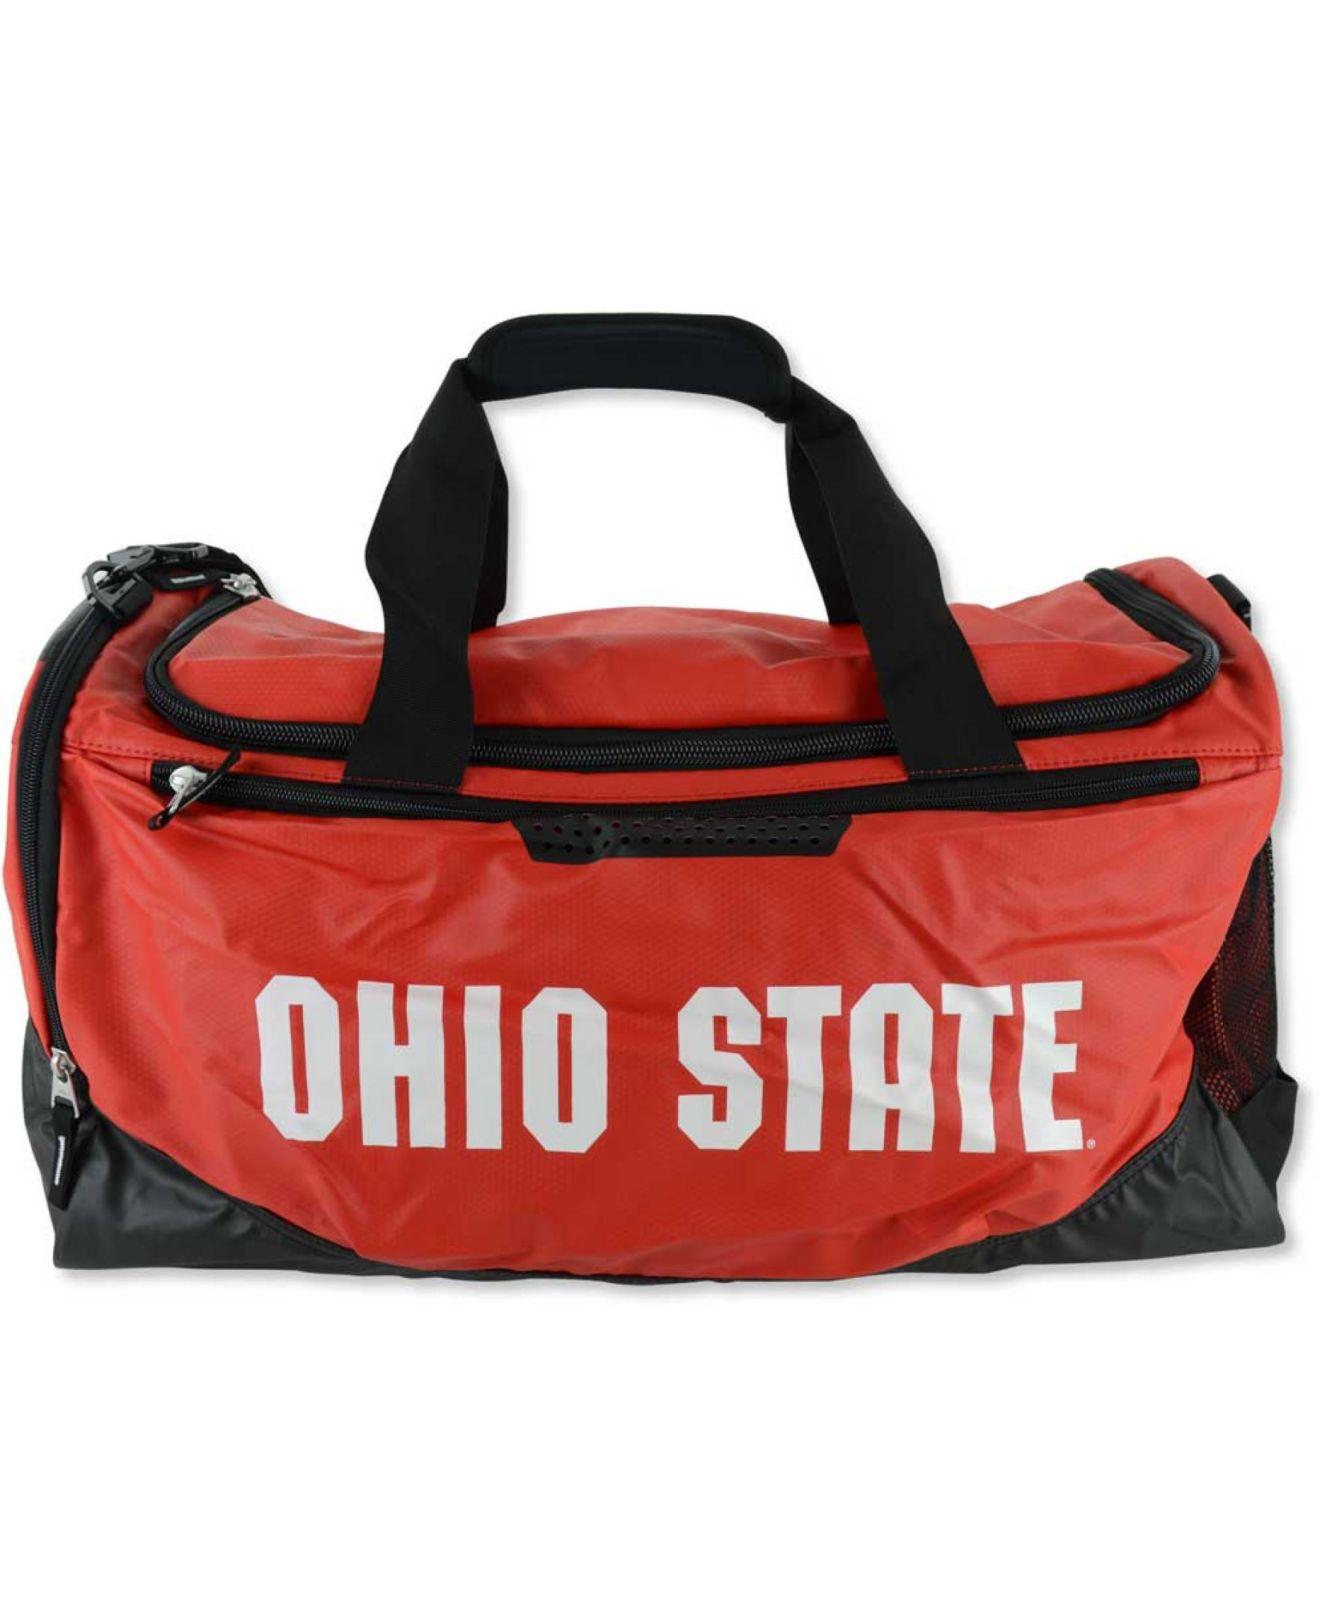 Lyst - Nike Ohio State Buckeyes Training Duffel Bag in Red for Men  Nike  Club Team Swoosh Duffel Bag - University ... f9fc63c750e87